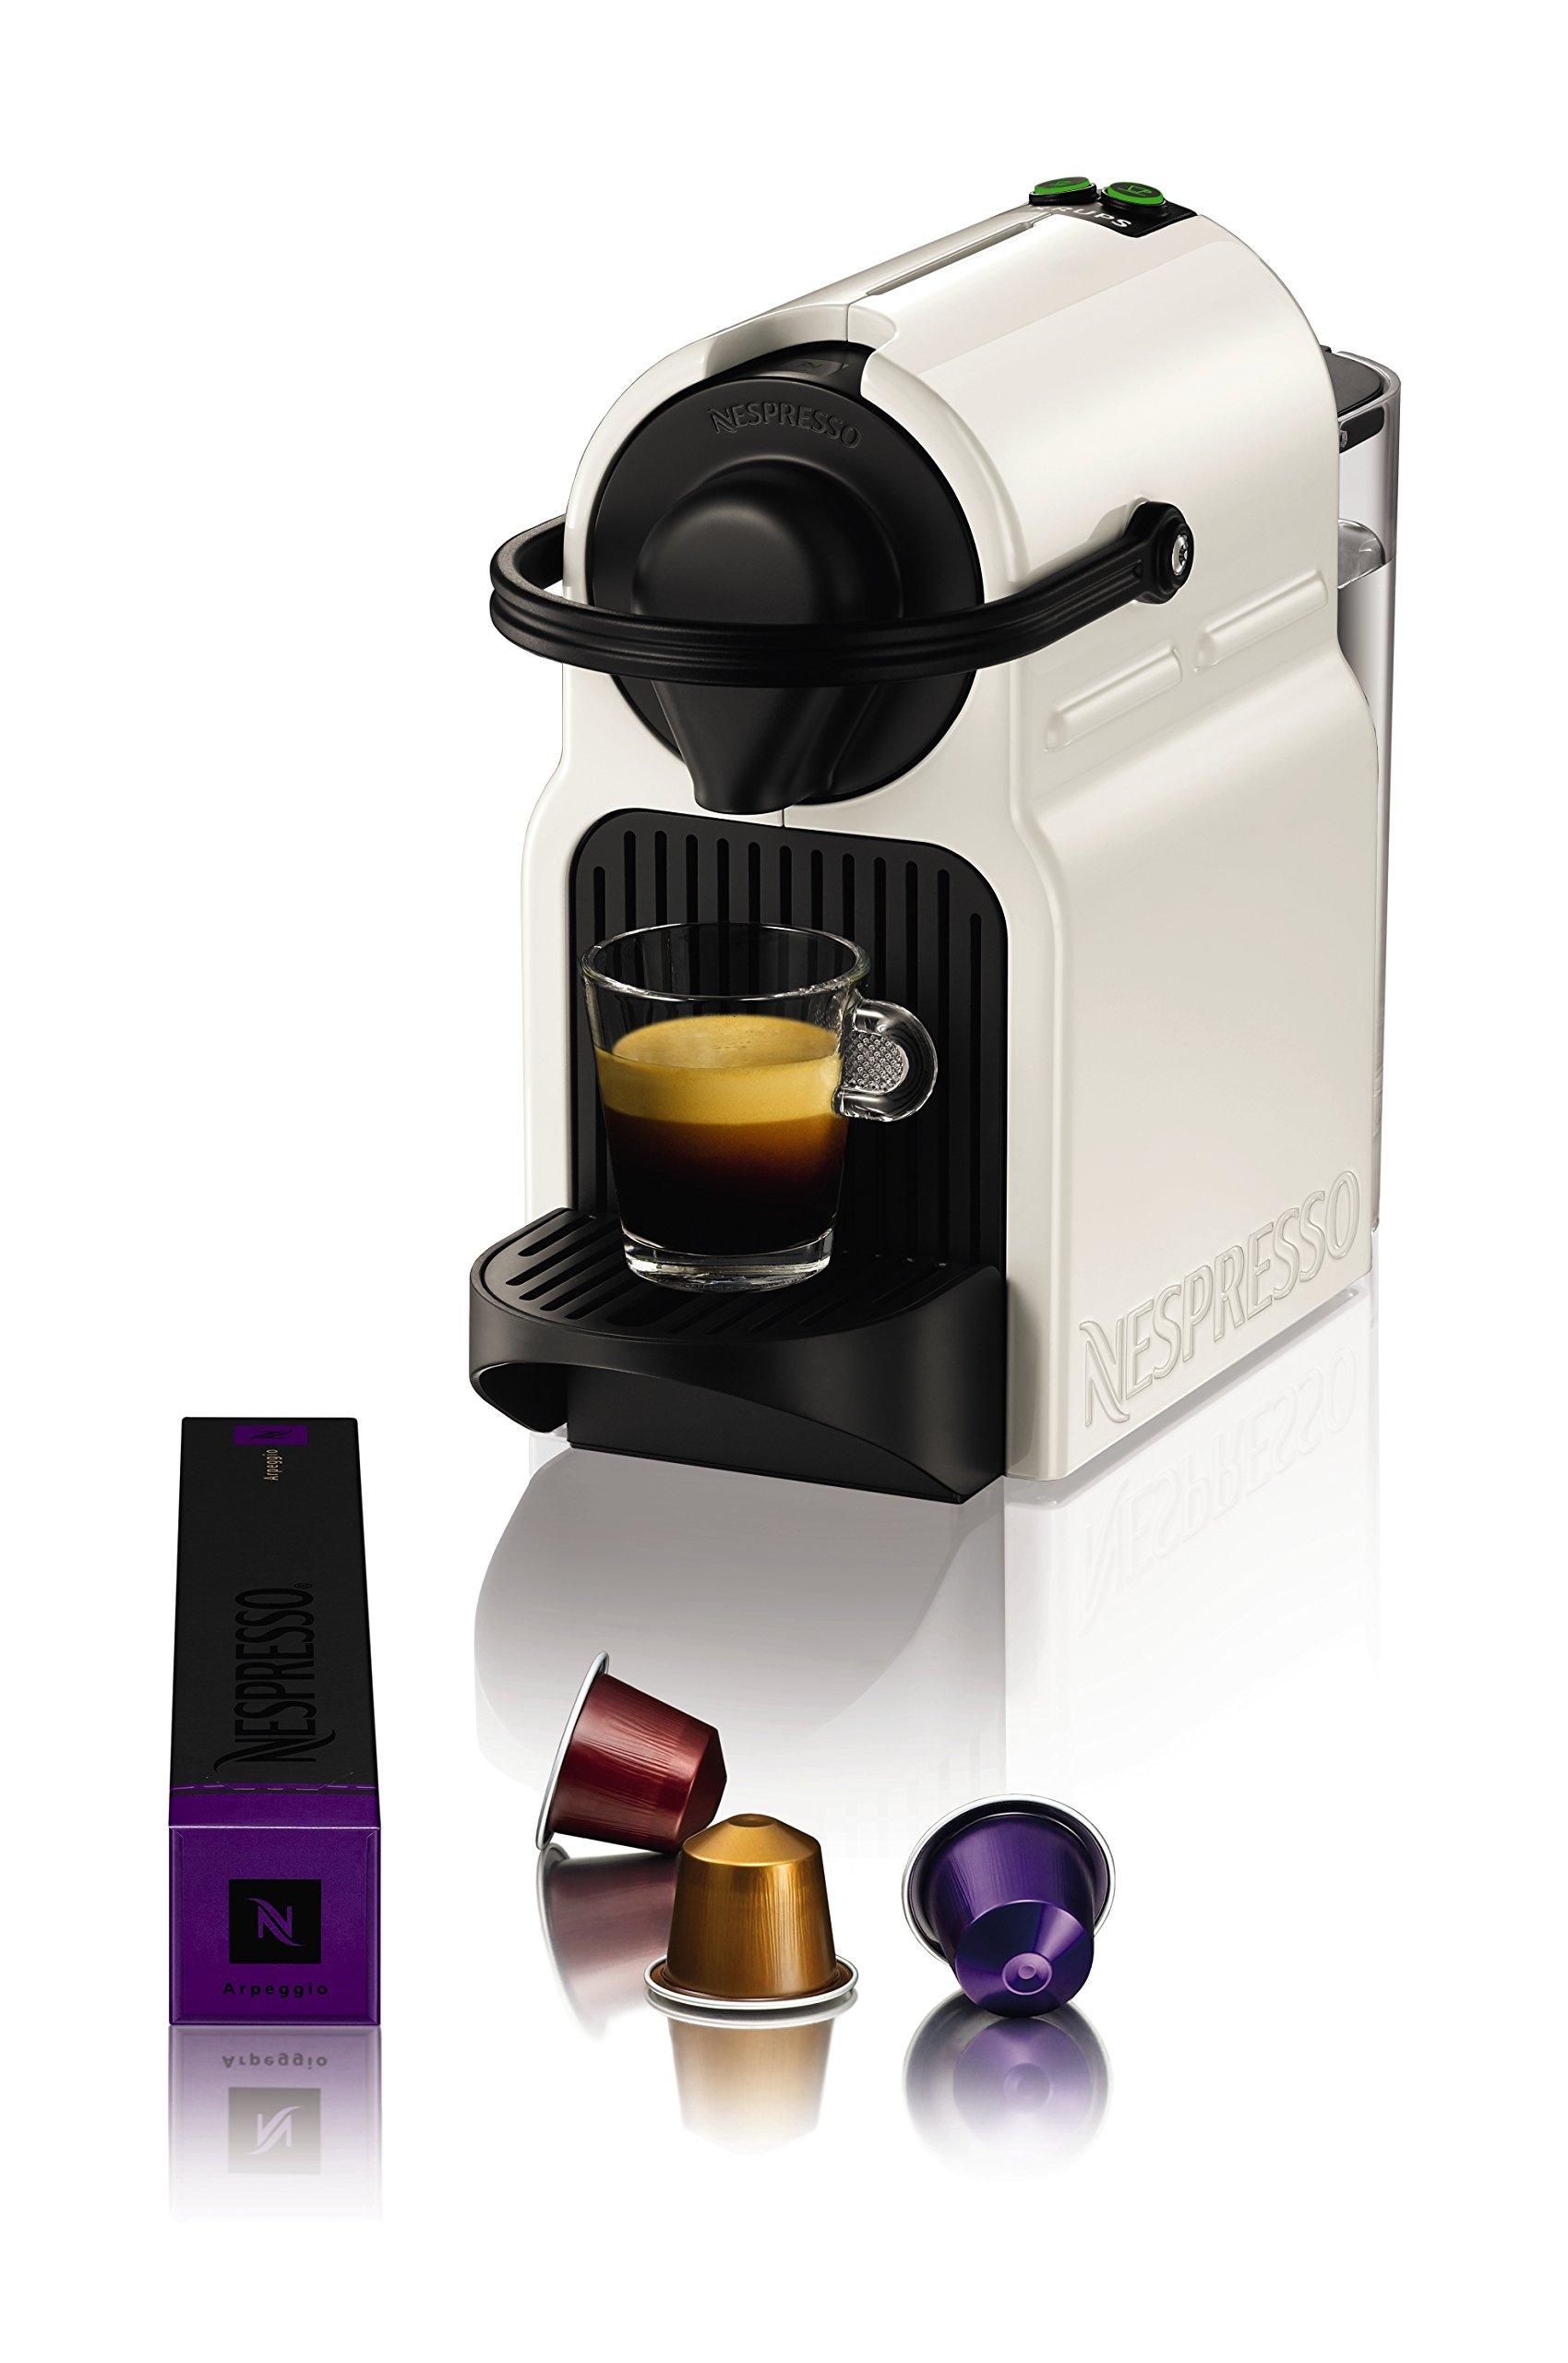 Nespresso Inissia Macchina per caffé espresso, a capsule, 1260 W, 0.7 L, Beige (Vanilla Cream) 5 spesavip